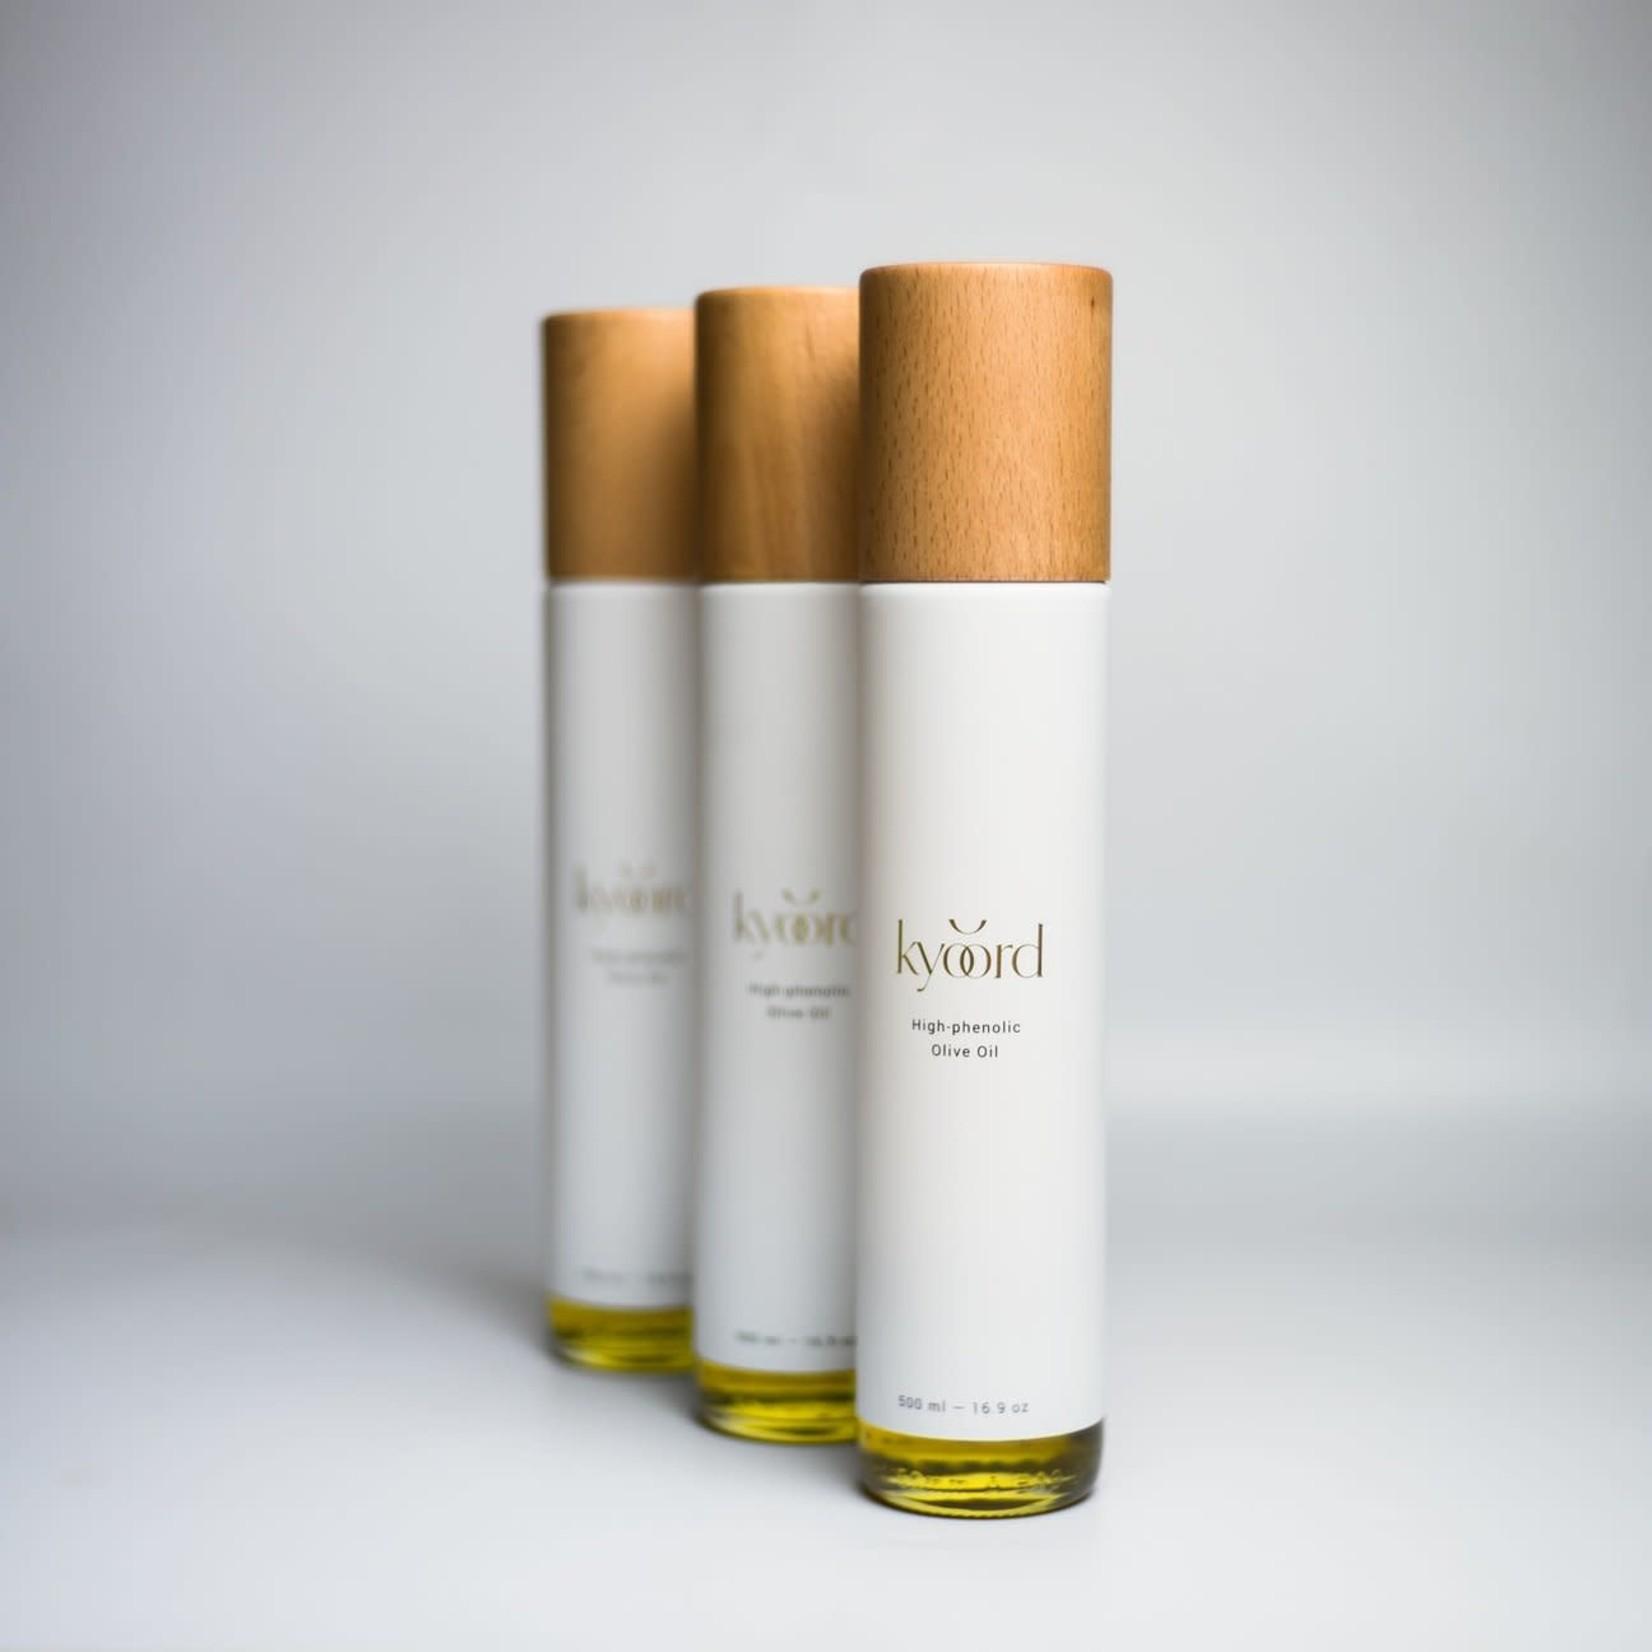 Kyoord High-Phenolic Olive Oil